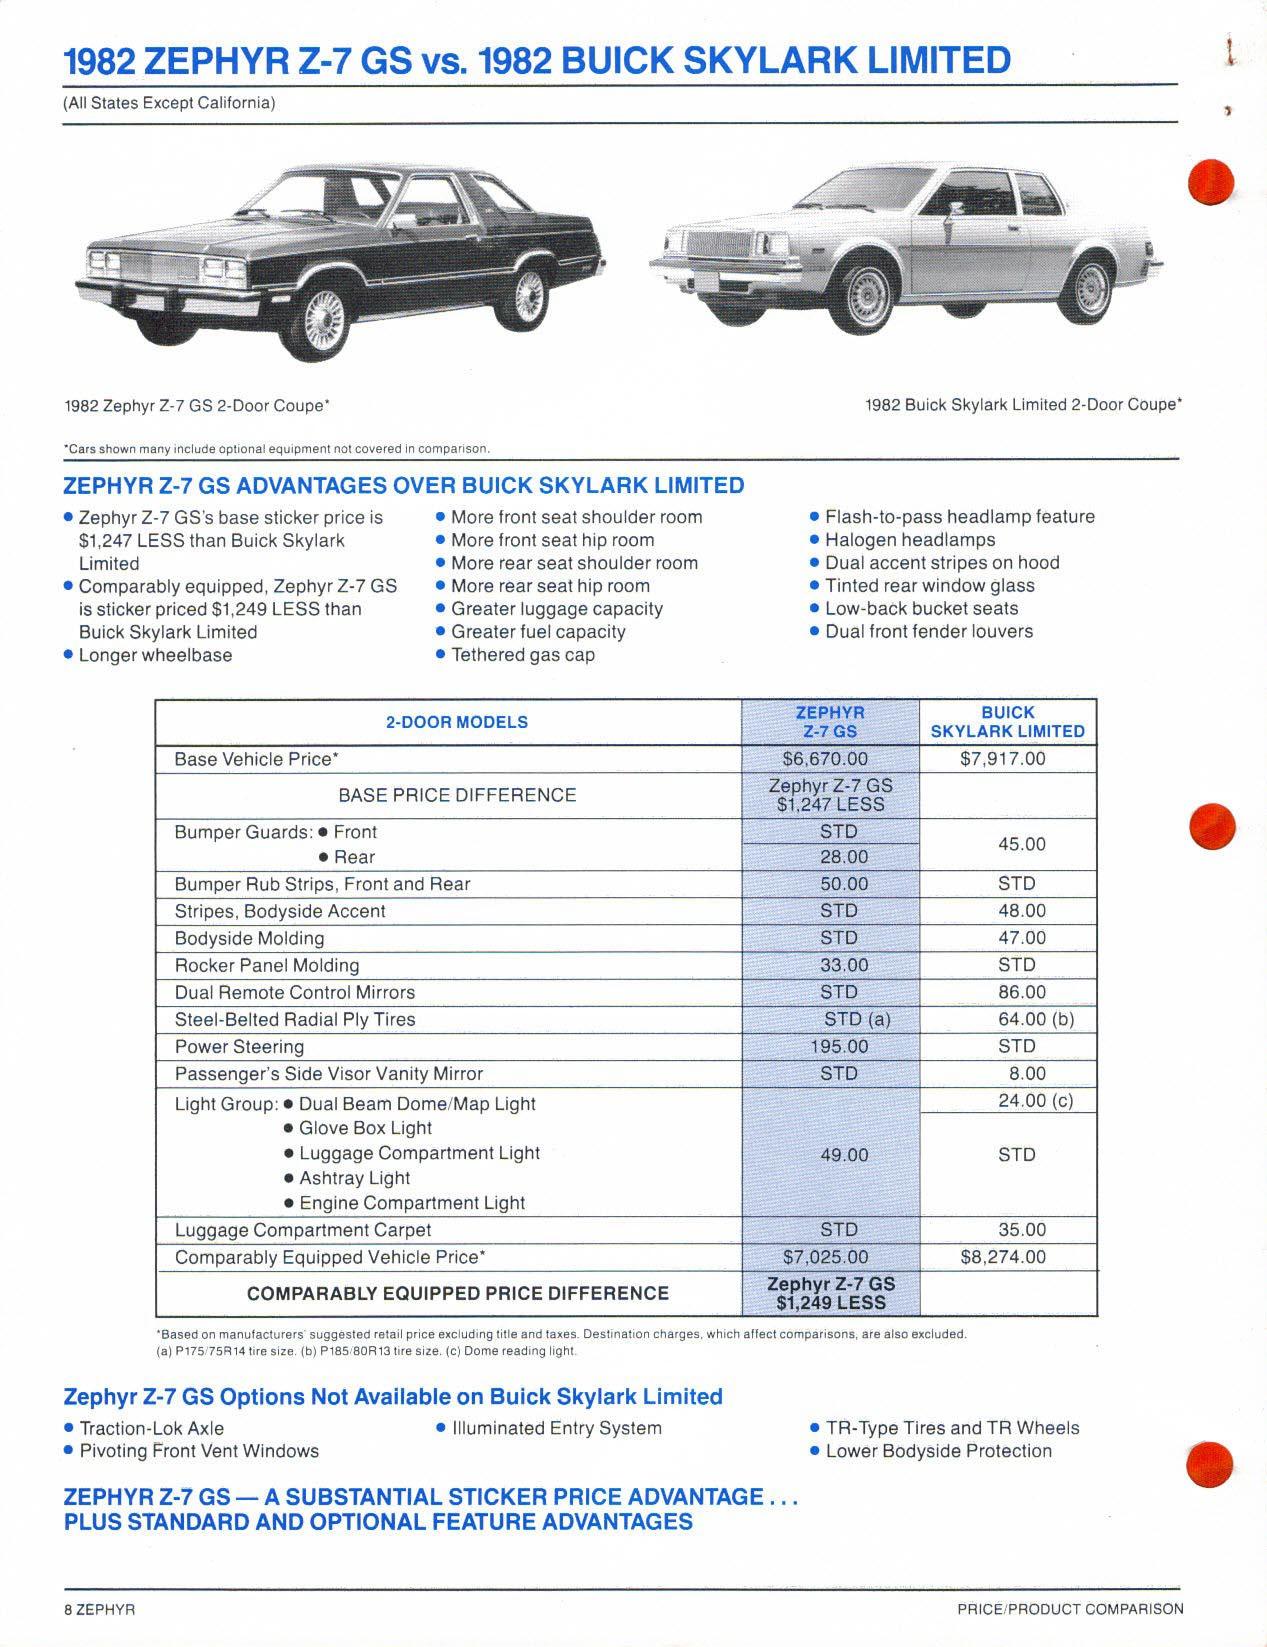 Suzuki Dfowners Manual